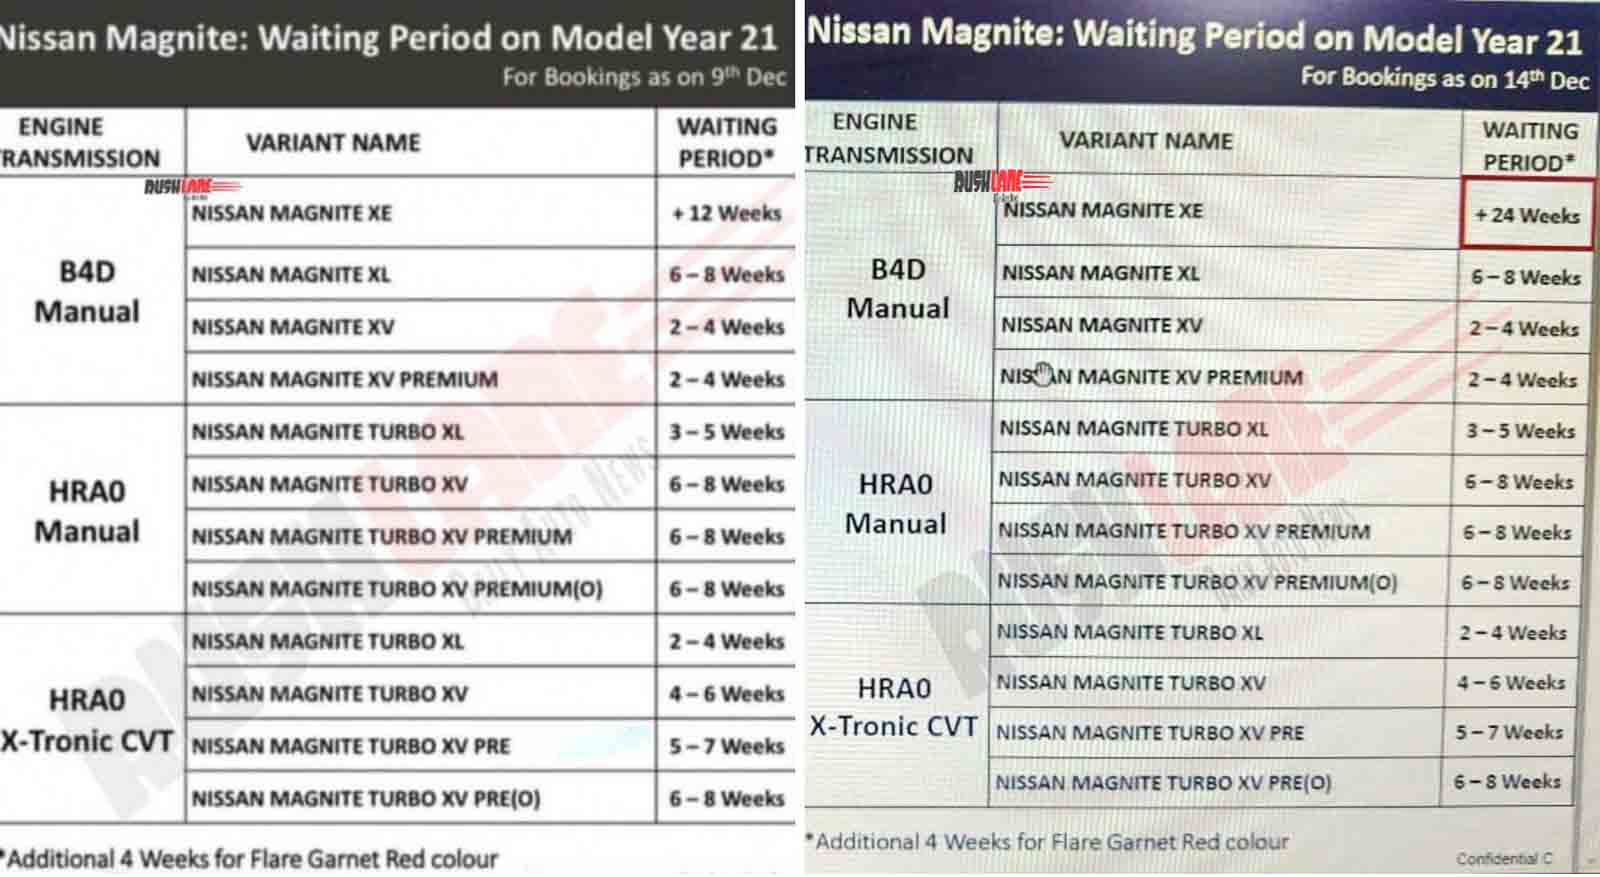 Nissan Magnite waiting period increase